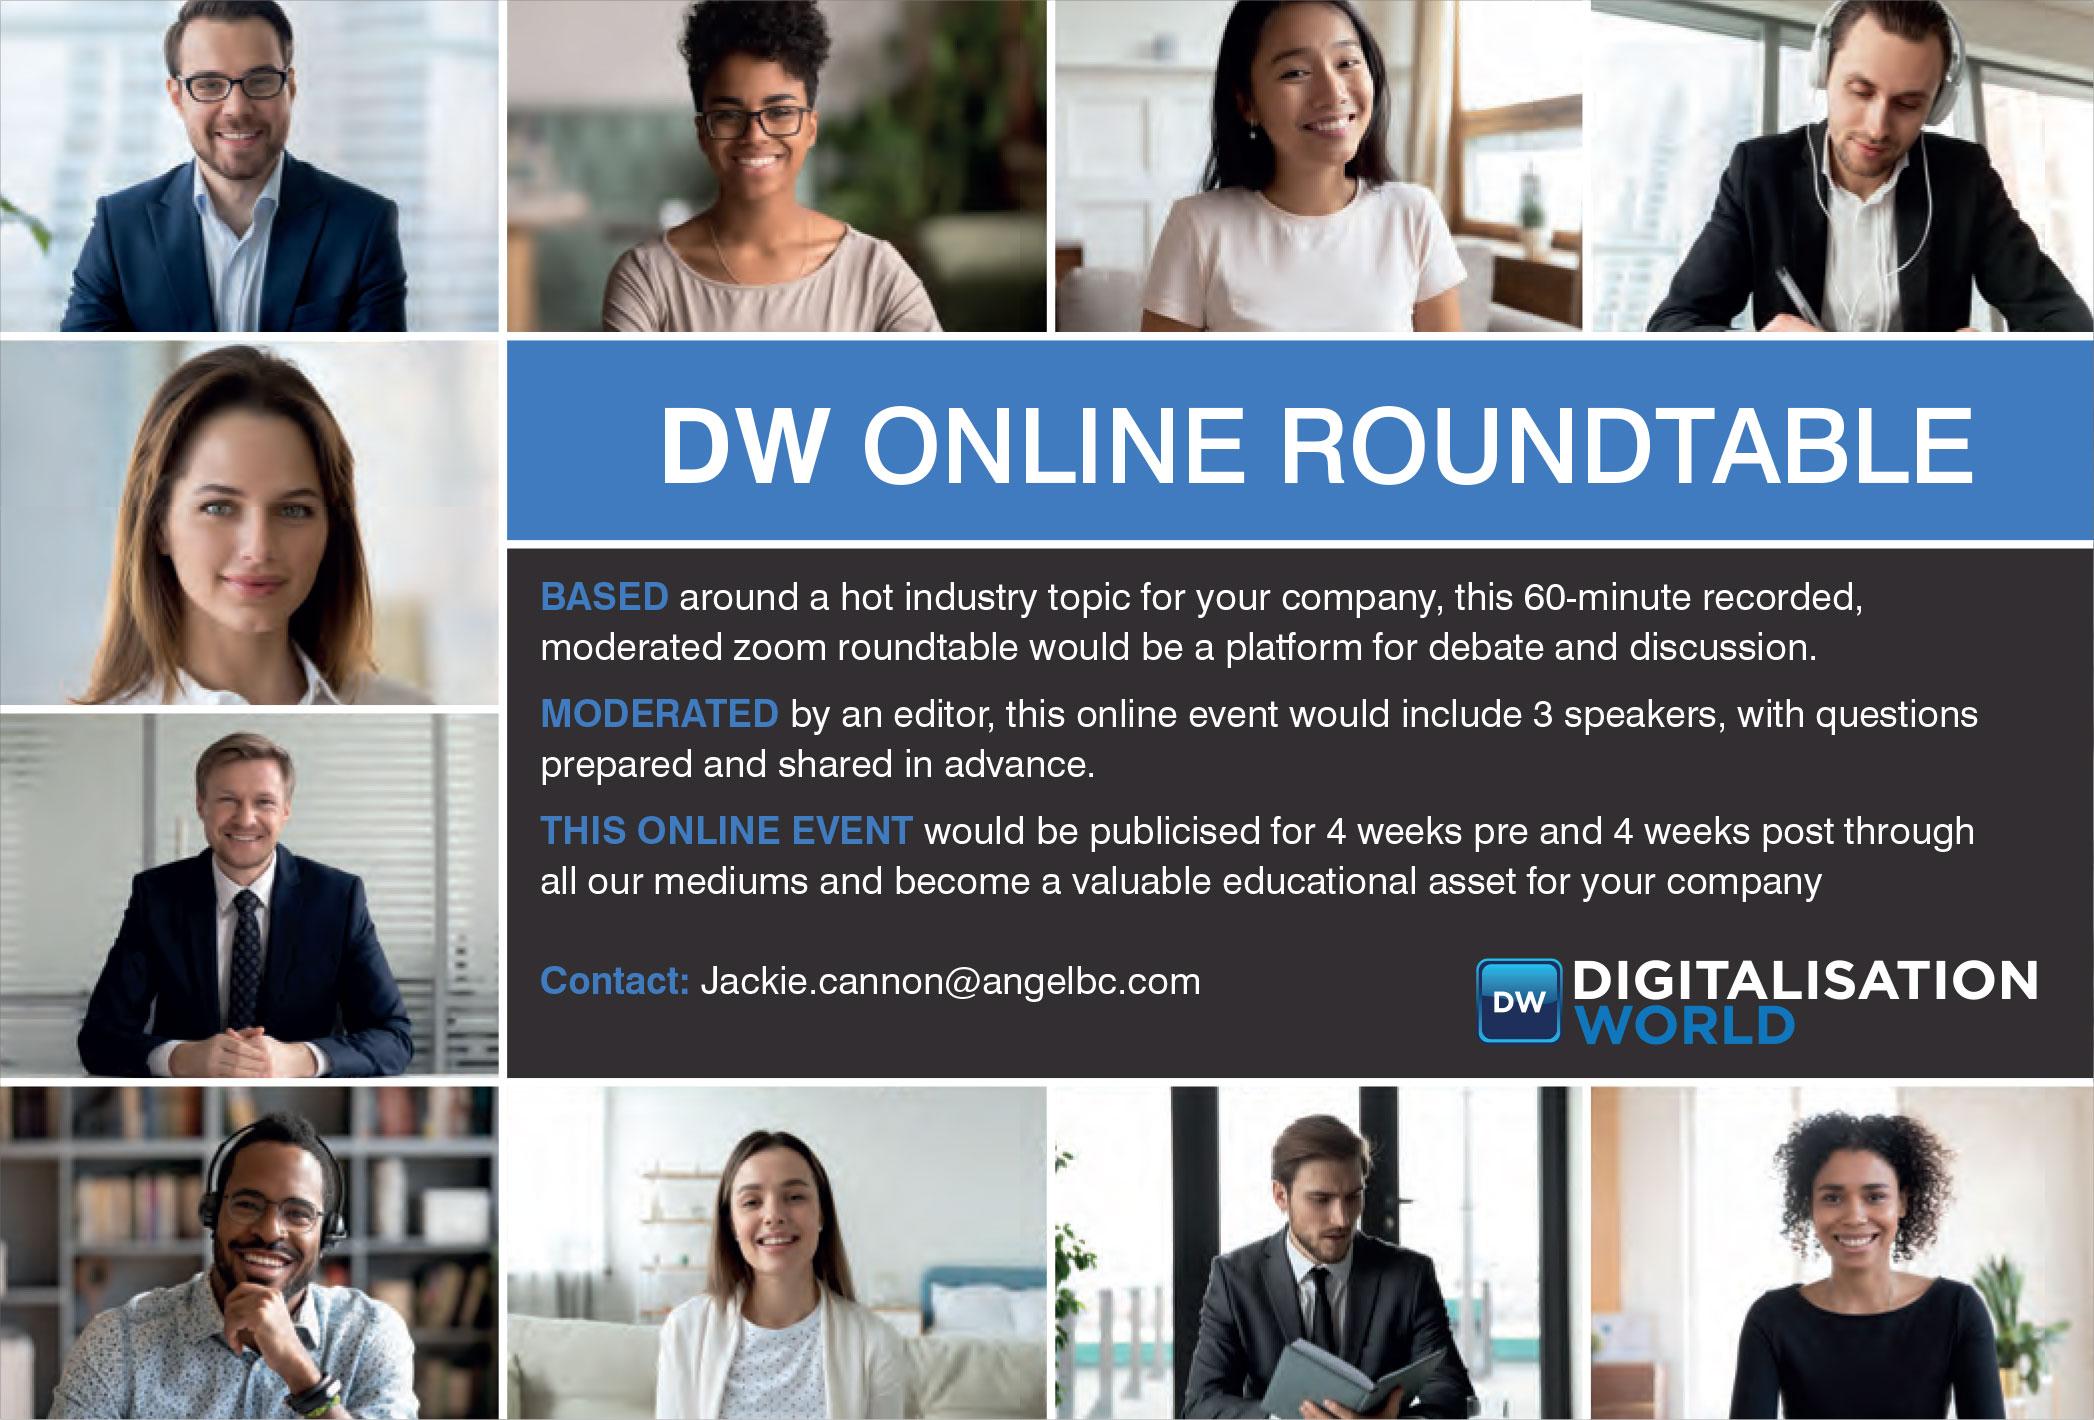 DW Roundtables